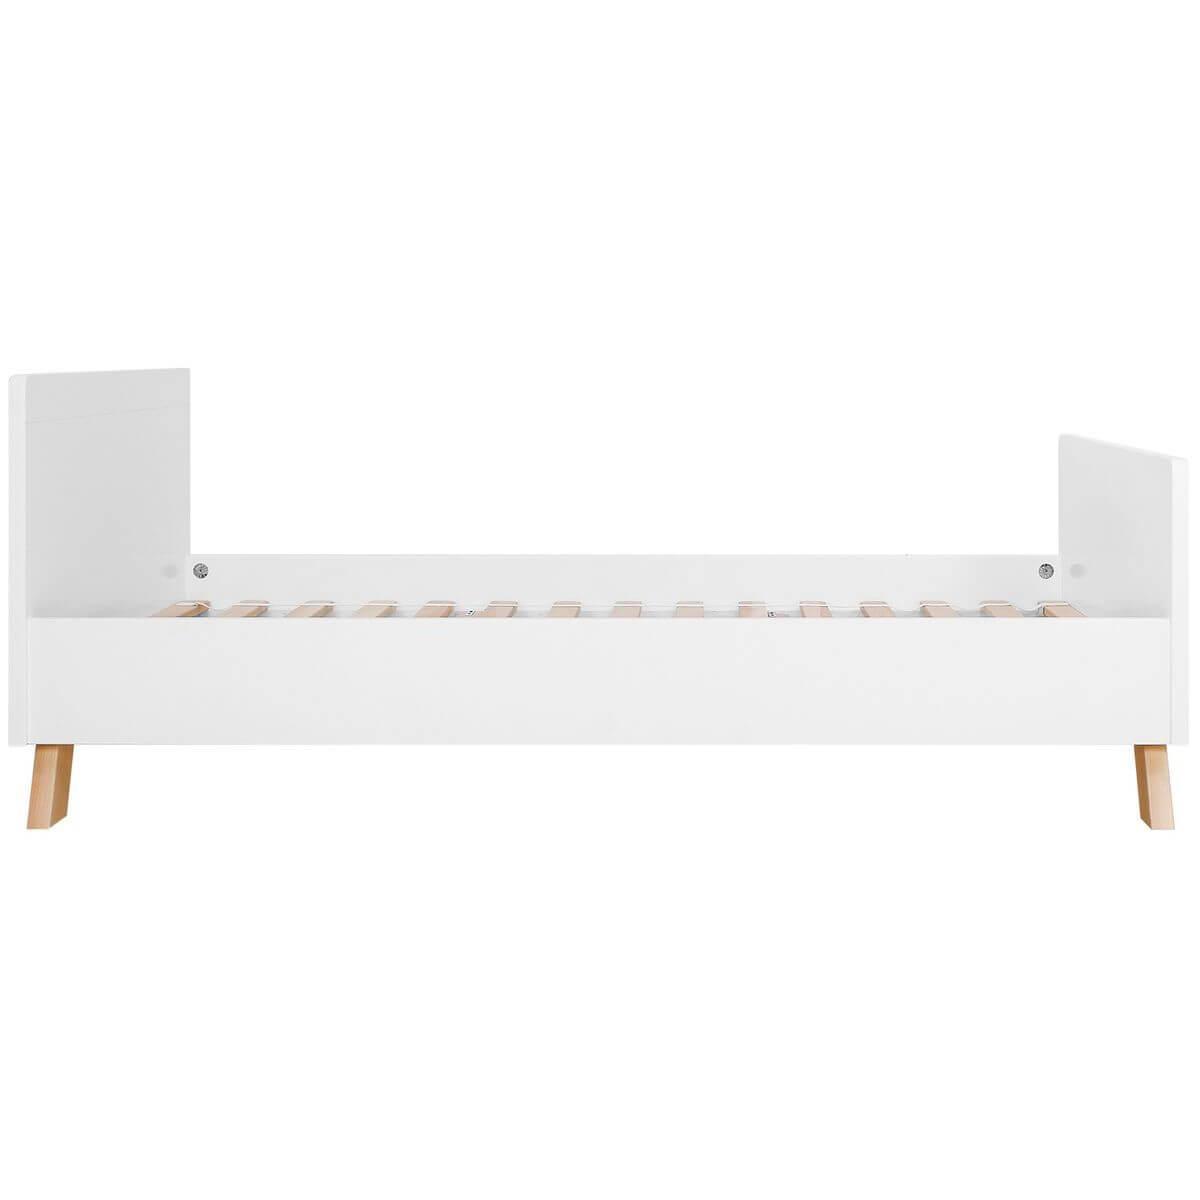 Lit 90x200cm LISA Bopita blanc-naturel